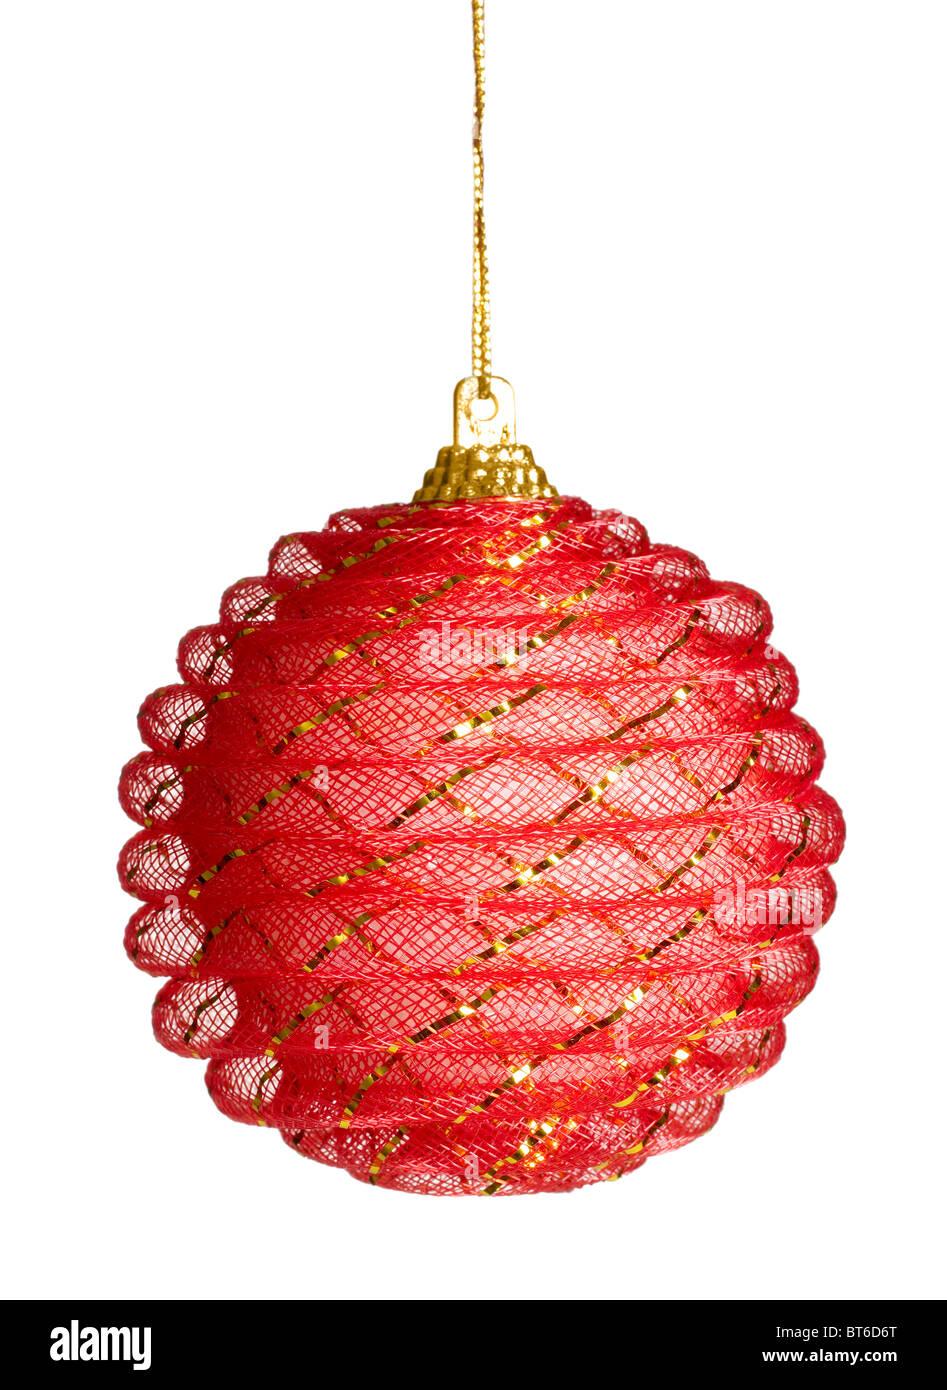 Red Christmas Ornaments.Red Christmas Ornaments Stock Photo 32104208 Alamy